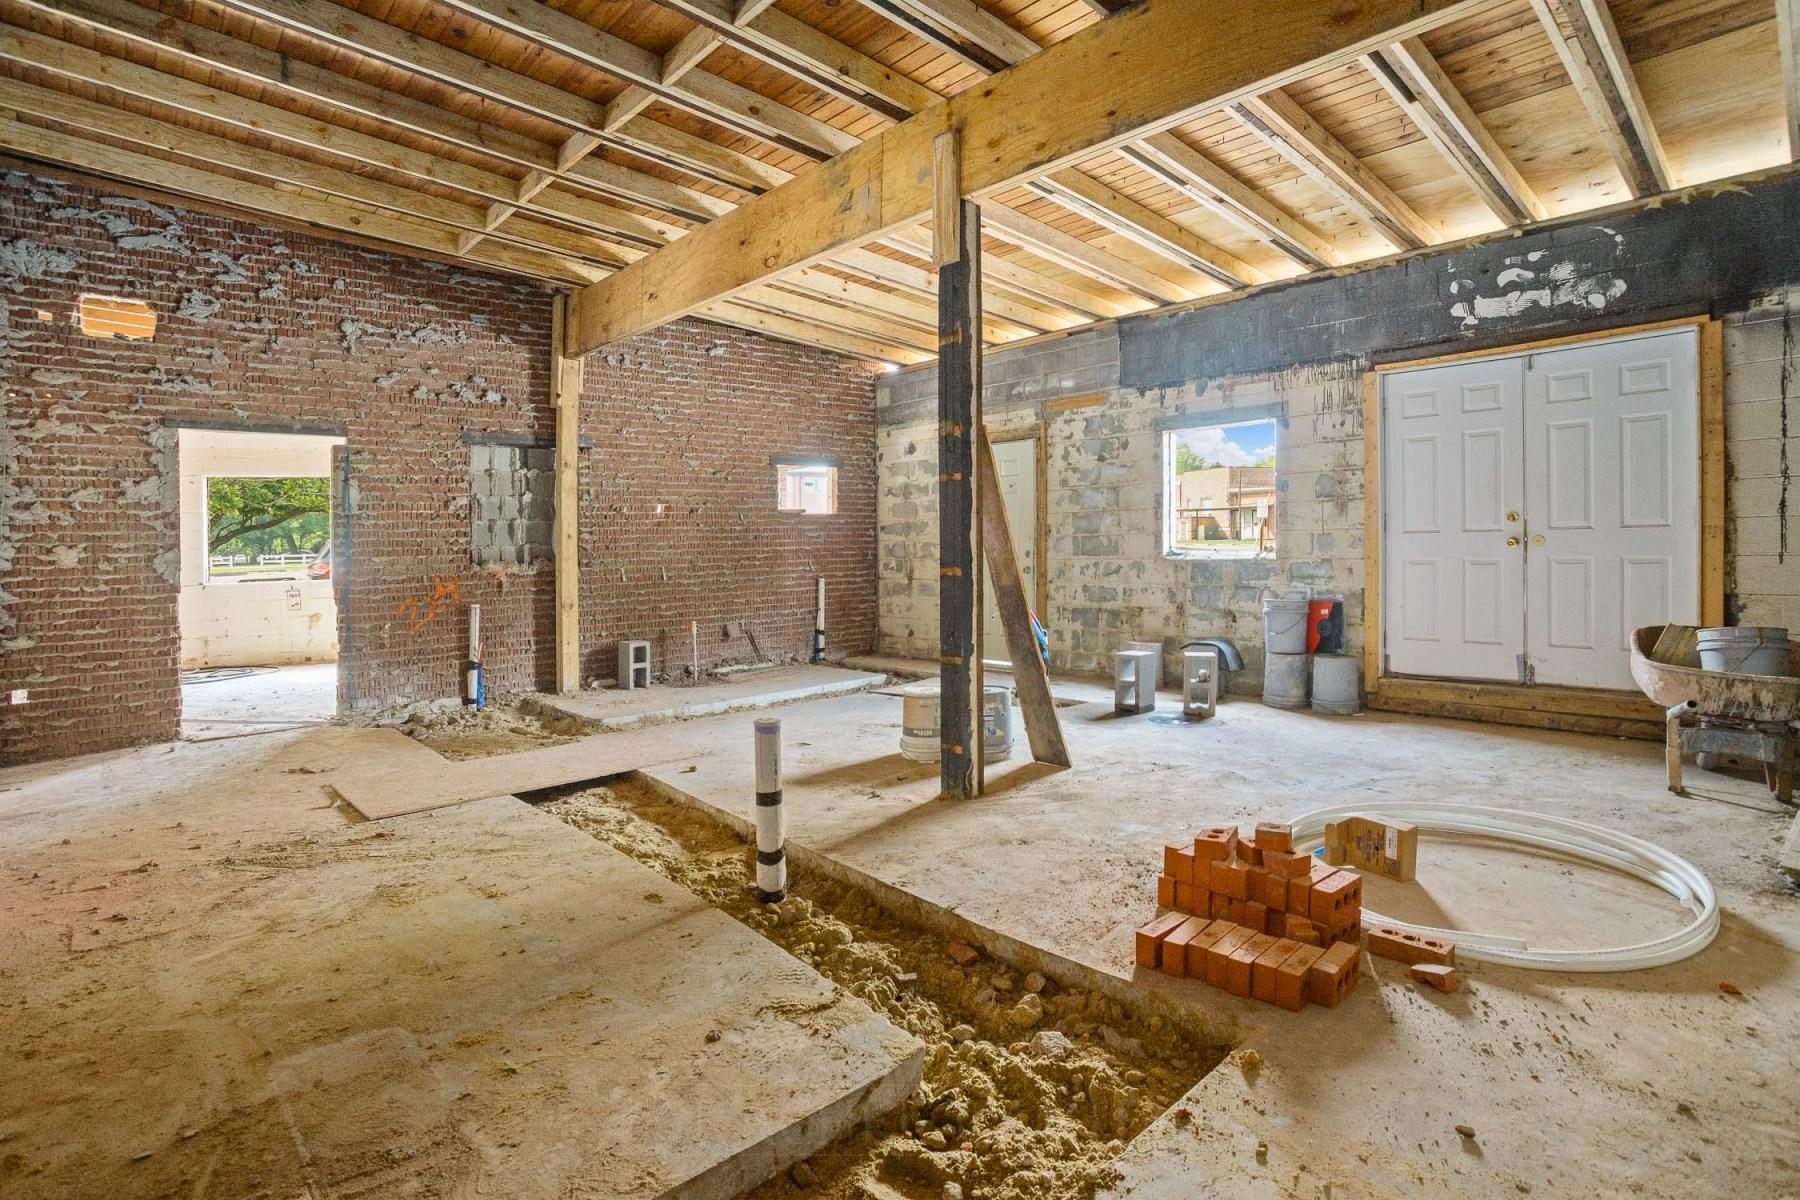 Horizons-East-Office-Renovation-1st-Set-27May2021_SB_01290_web-size